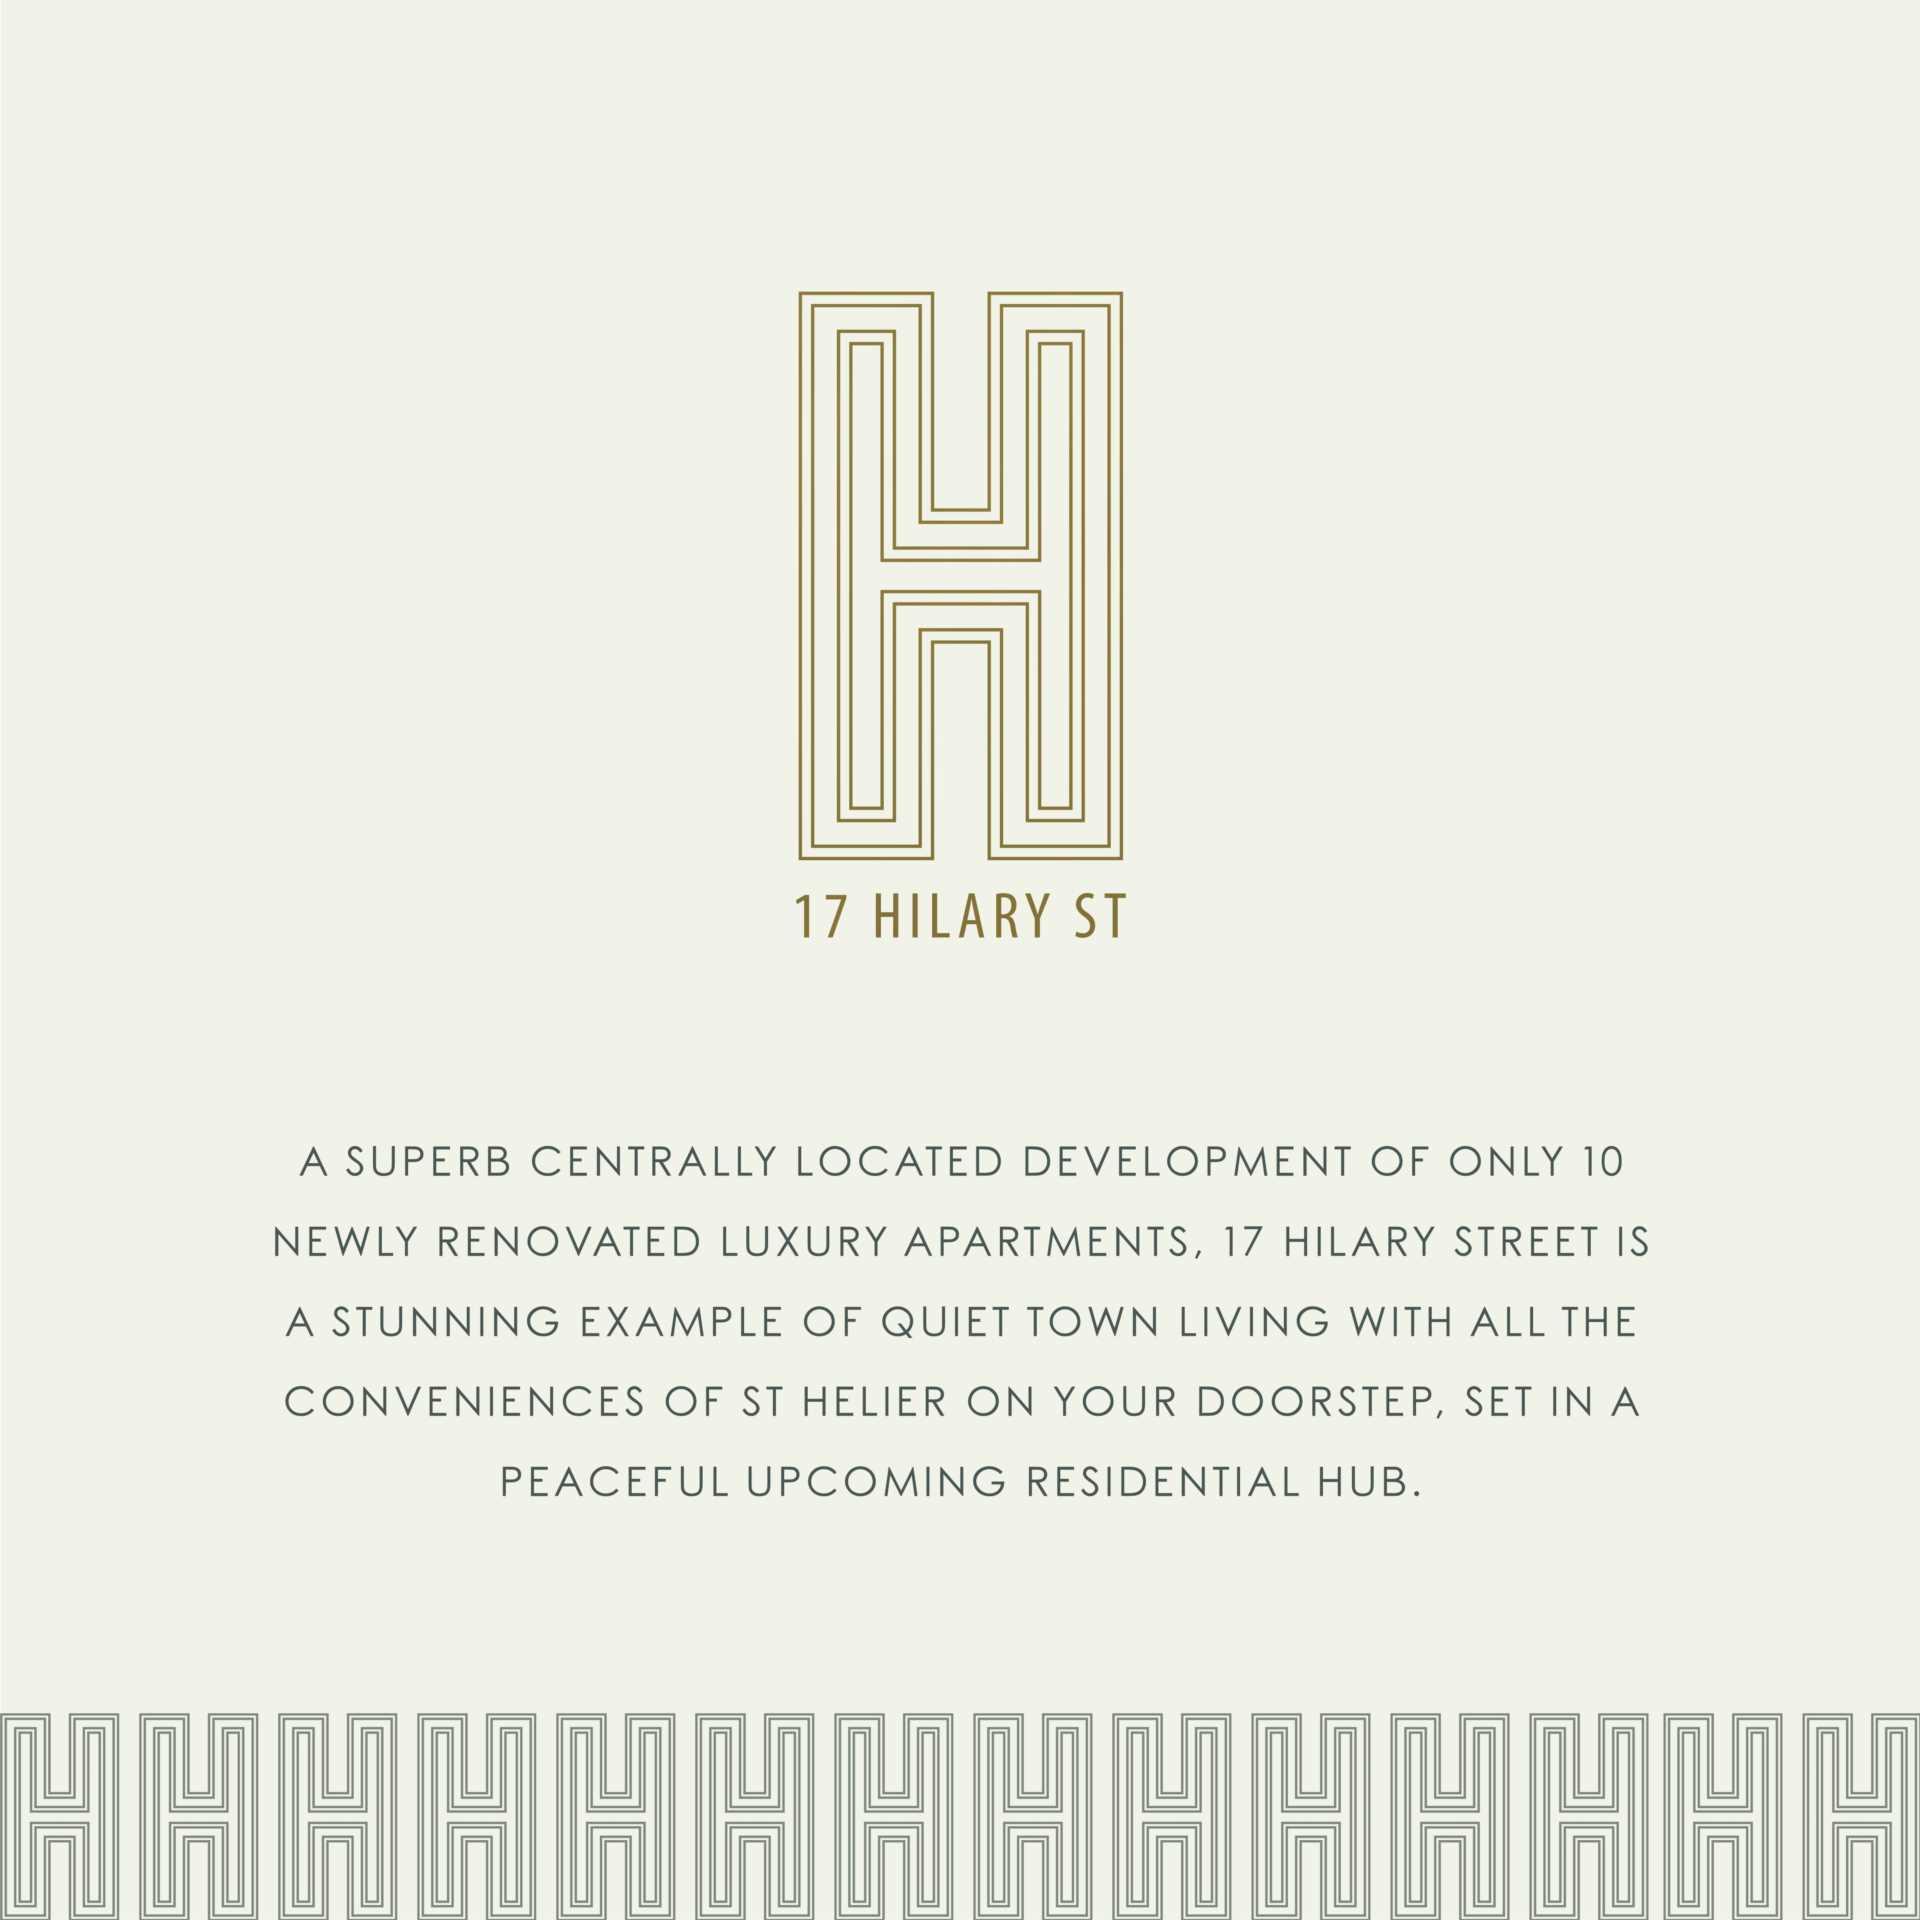 Flat 7, 17 Hilary Street, Image 3